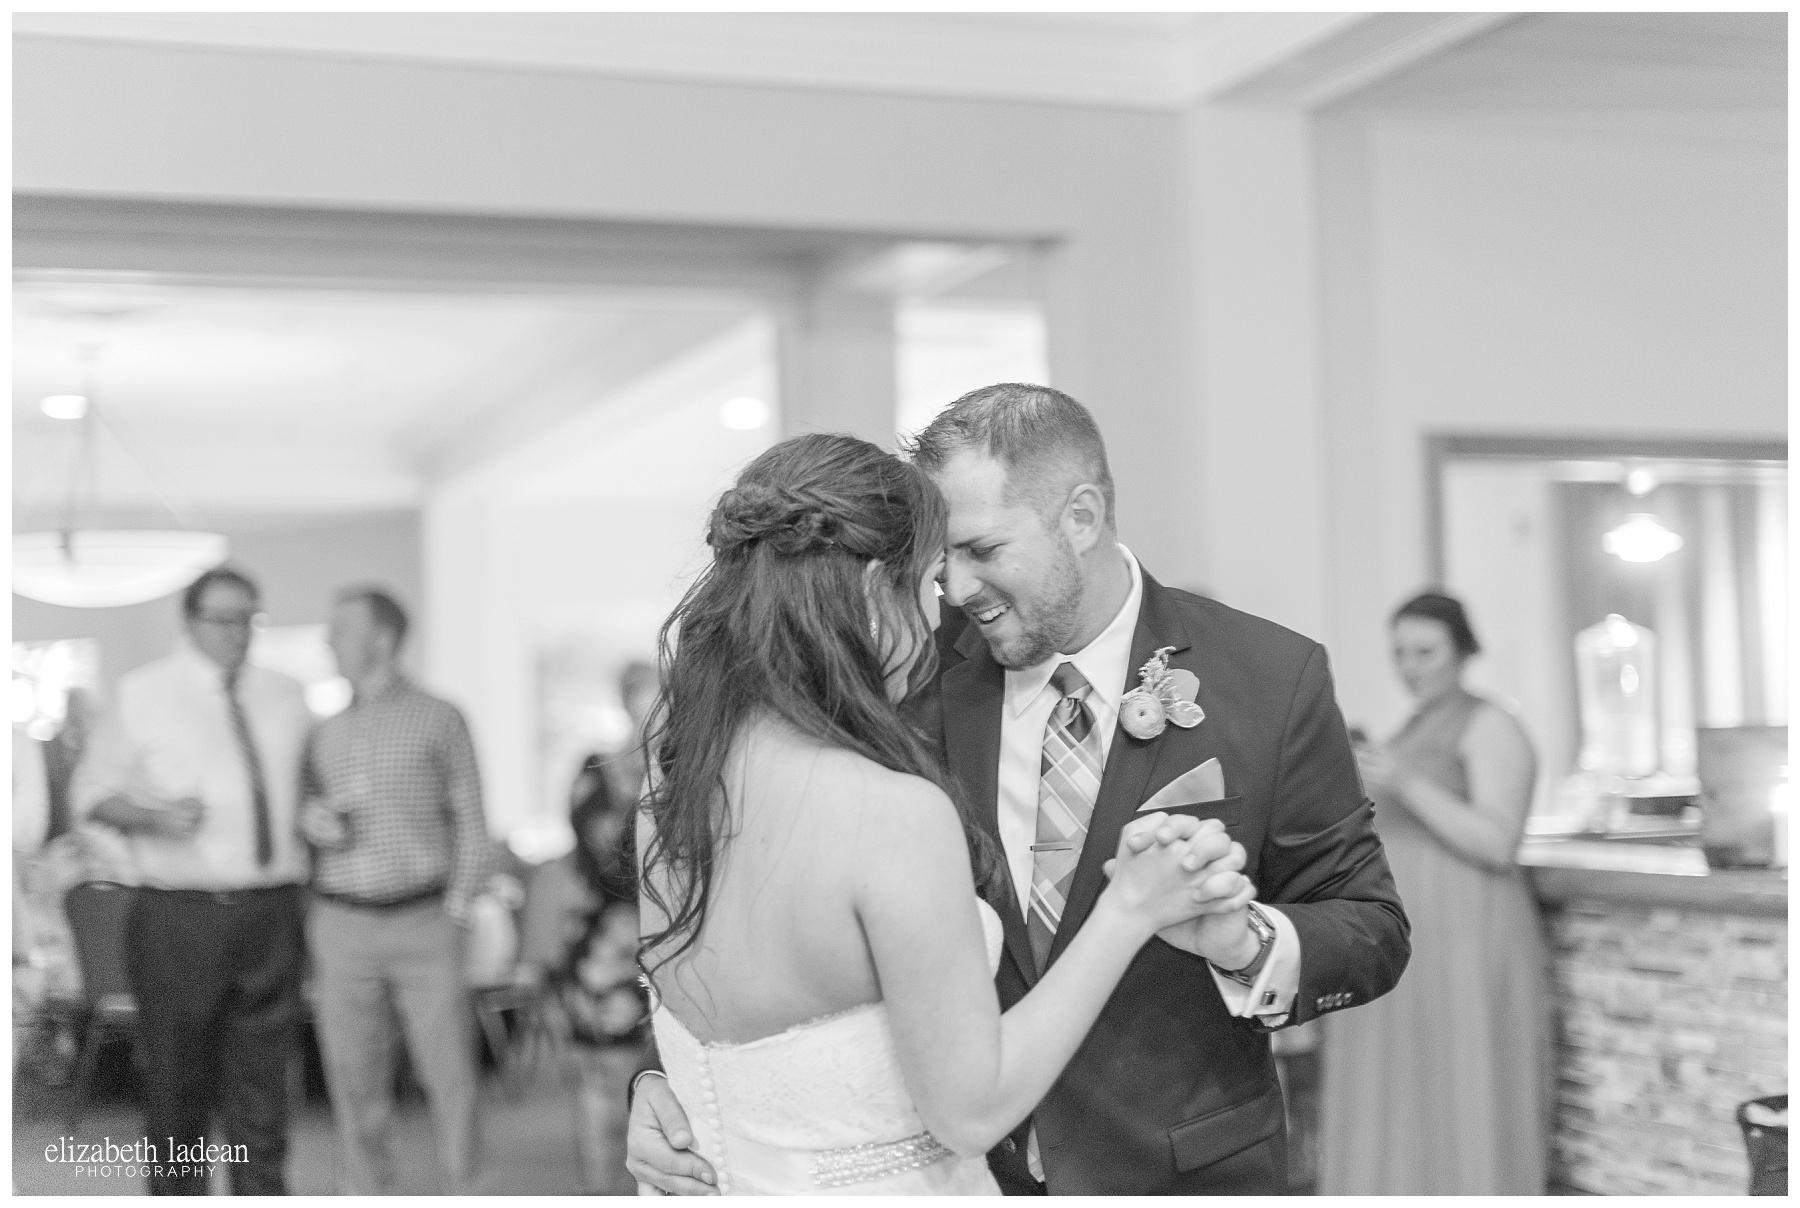 Hillcrest-Country-Club-Kansas-City-Wedding-Photography-E+J-0520-Elizabeth-Ladean-Photography-photo_0883.jpg